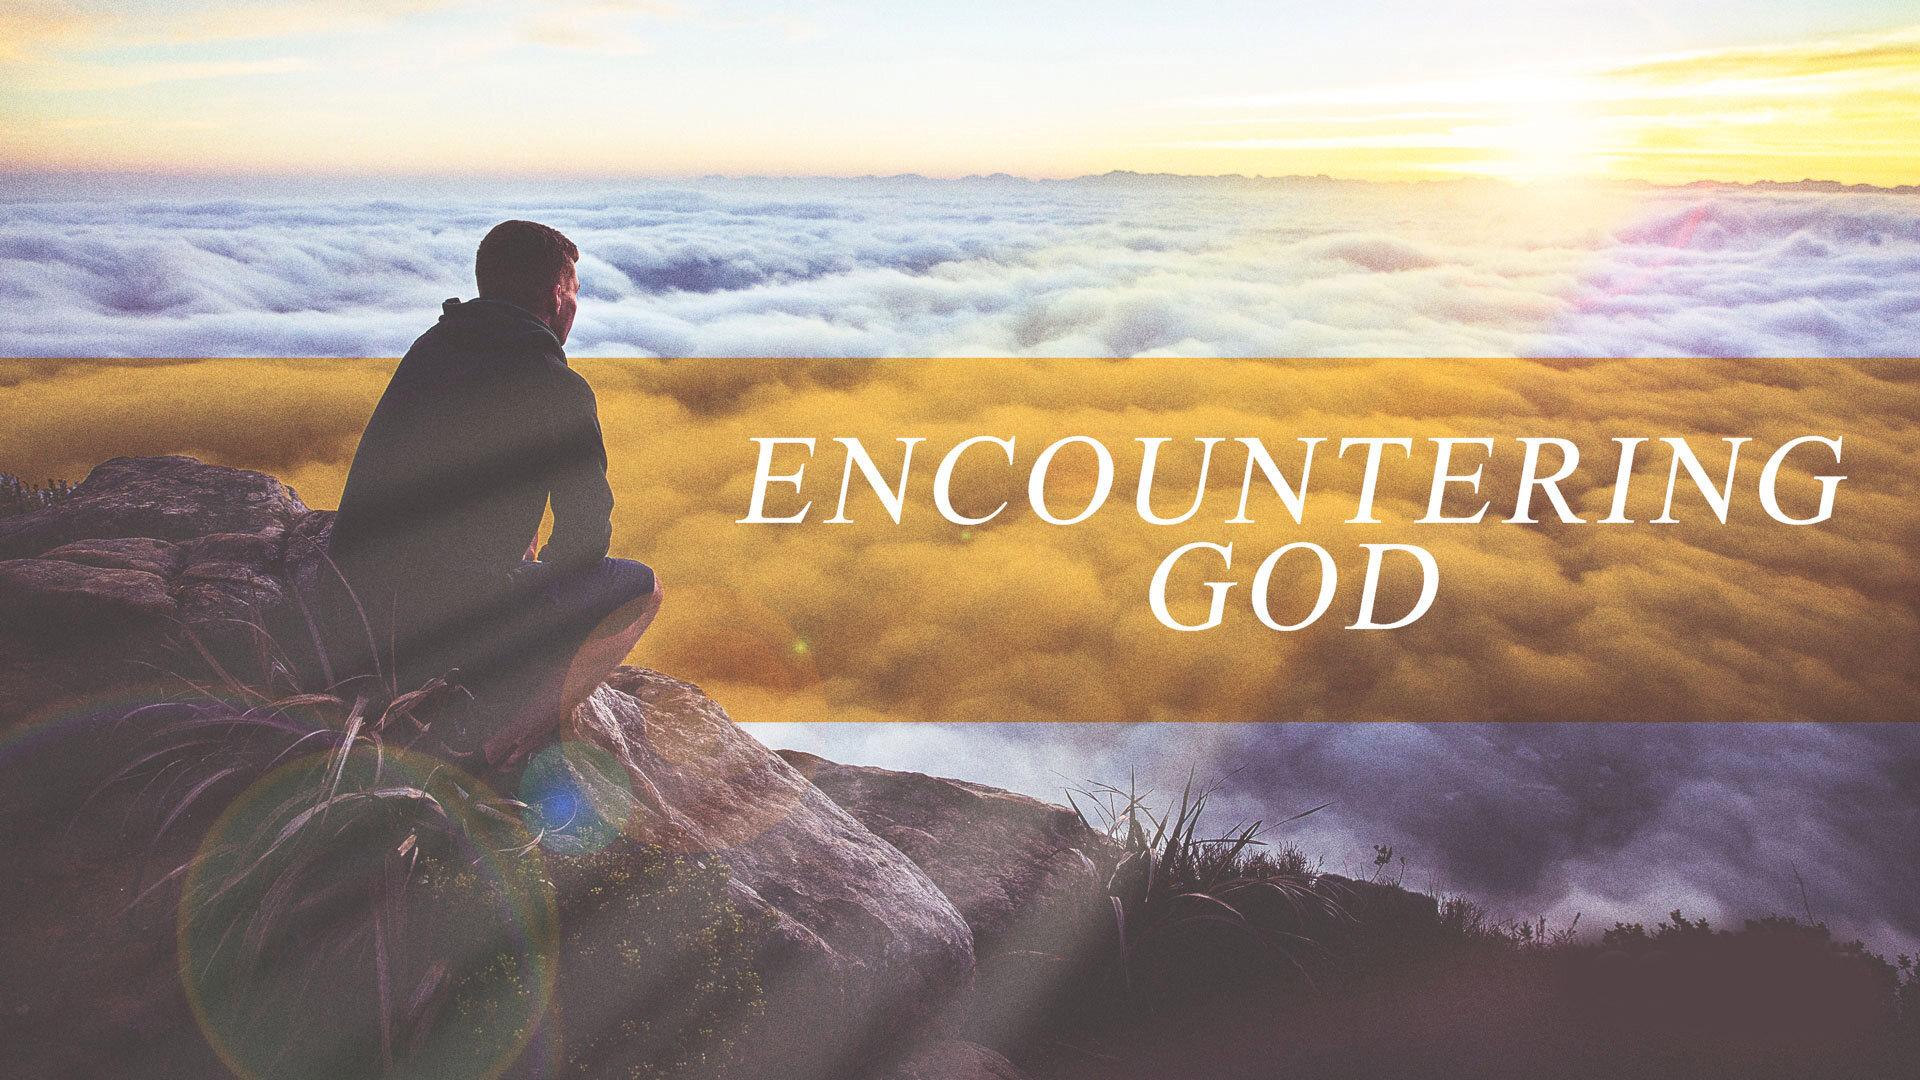 Encountering-God .jpg